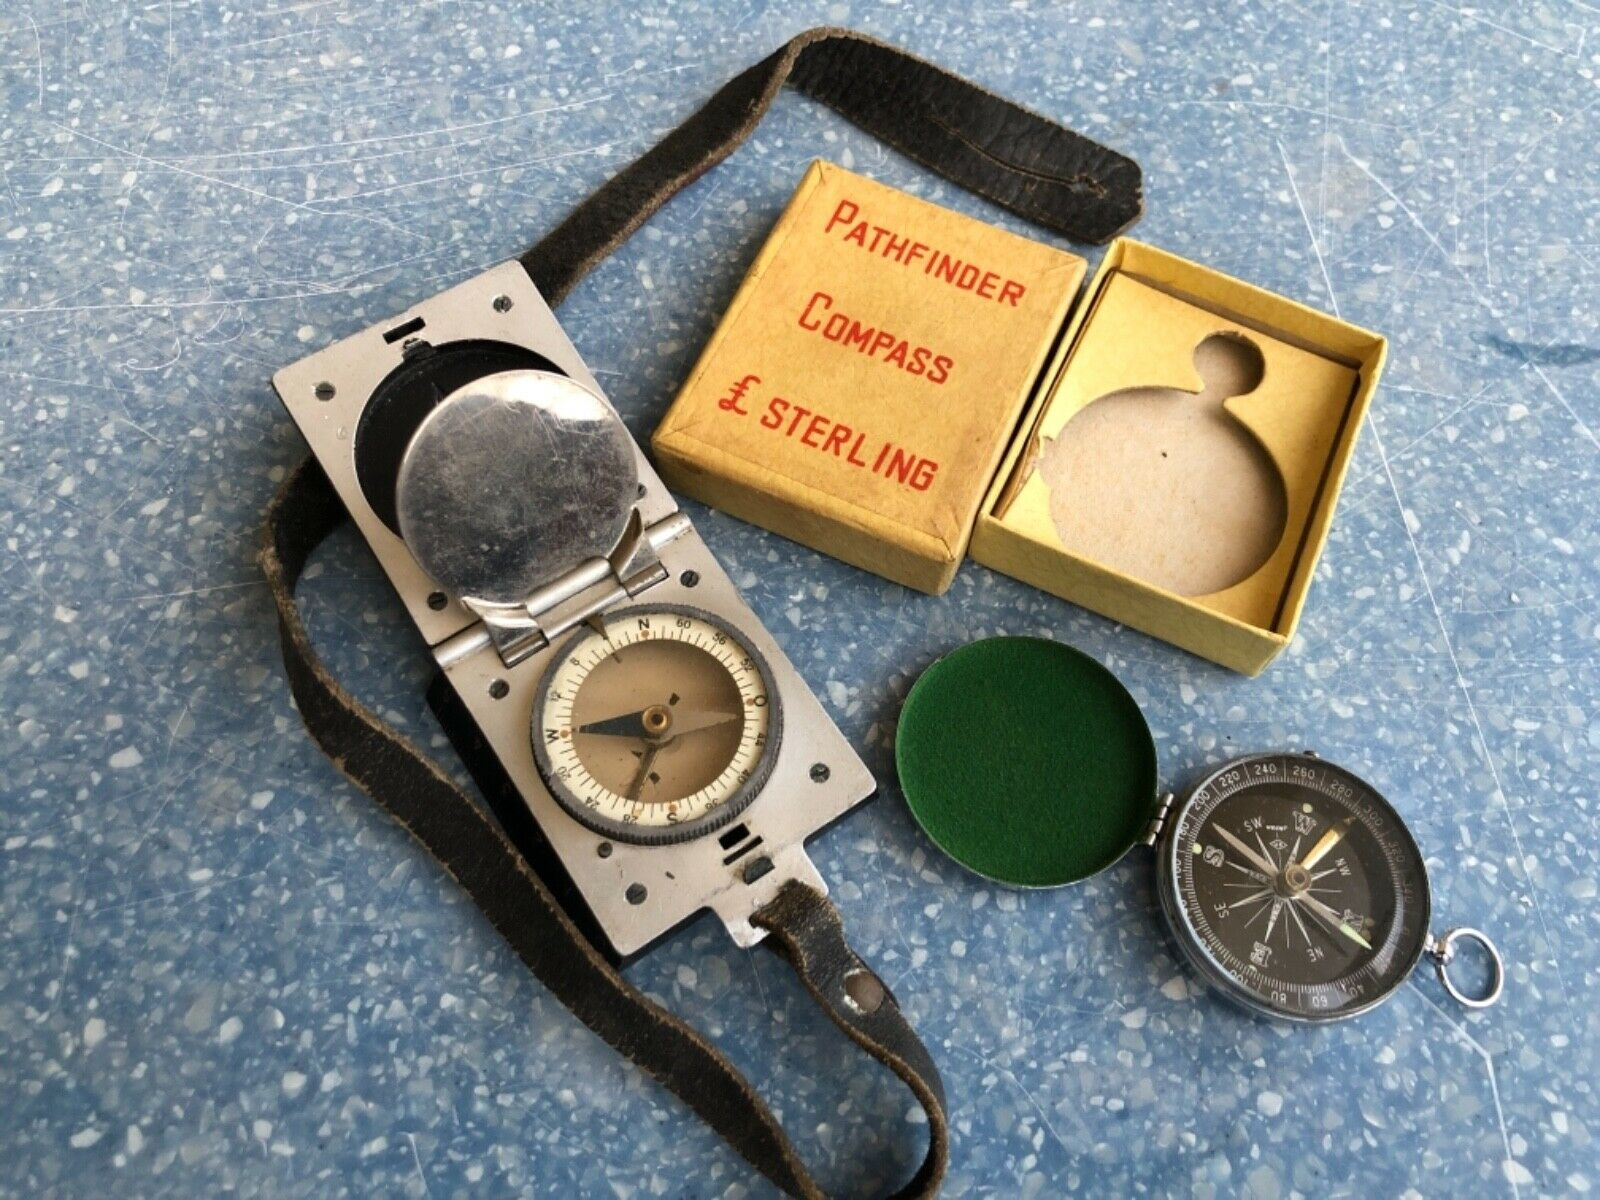 2 Vintage German Marsh Kompass + strap + Precise Pathfinder Compass